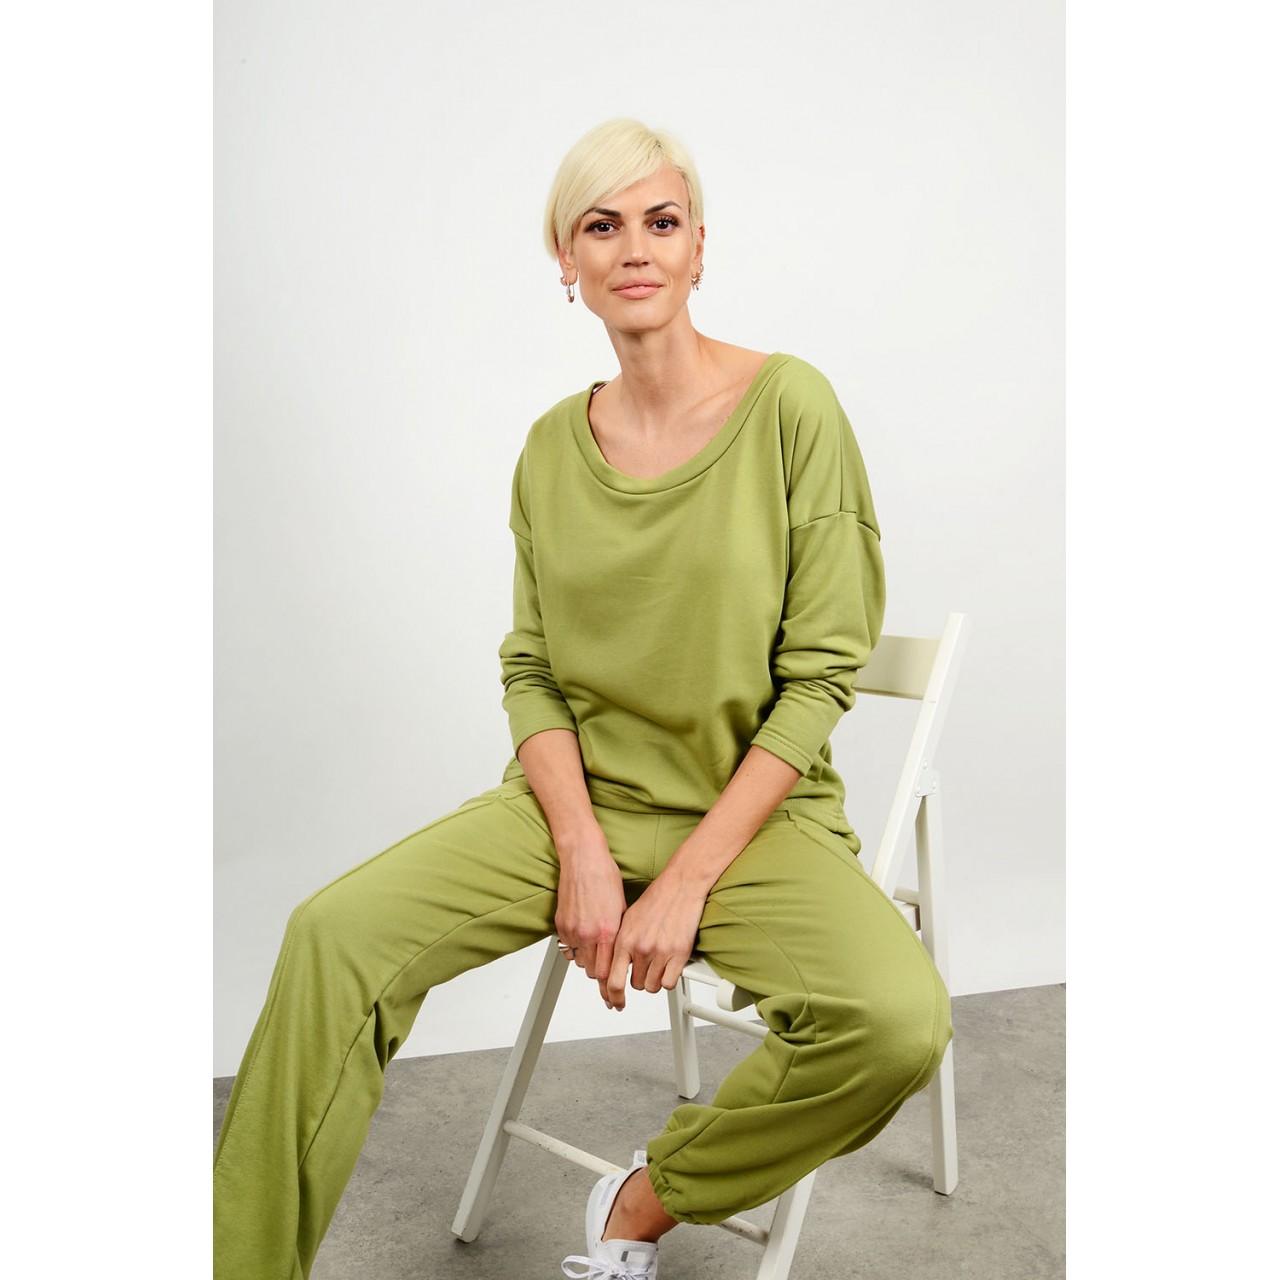 Sweatshirt tracksuit set blouse with pant